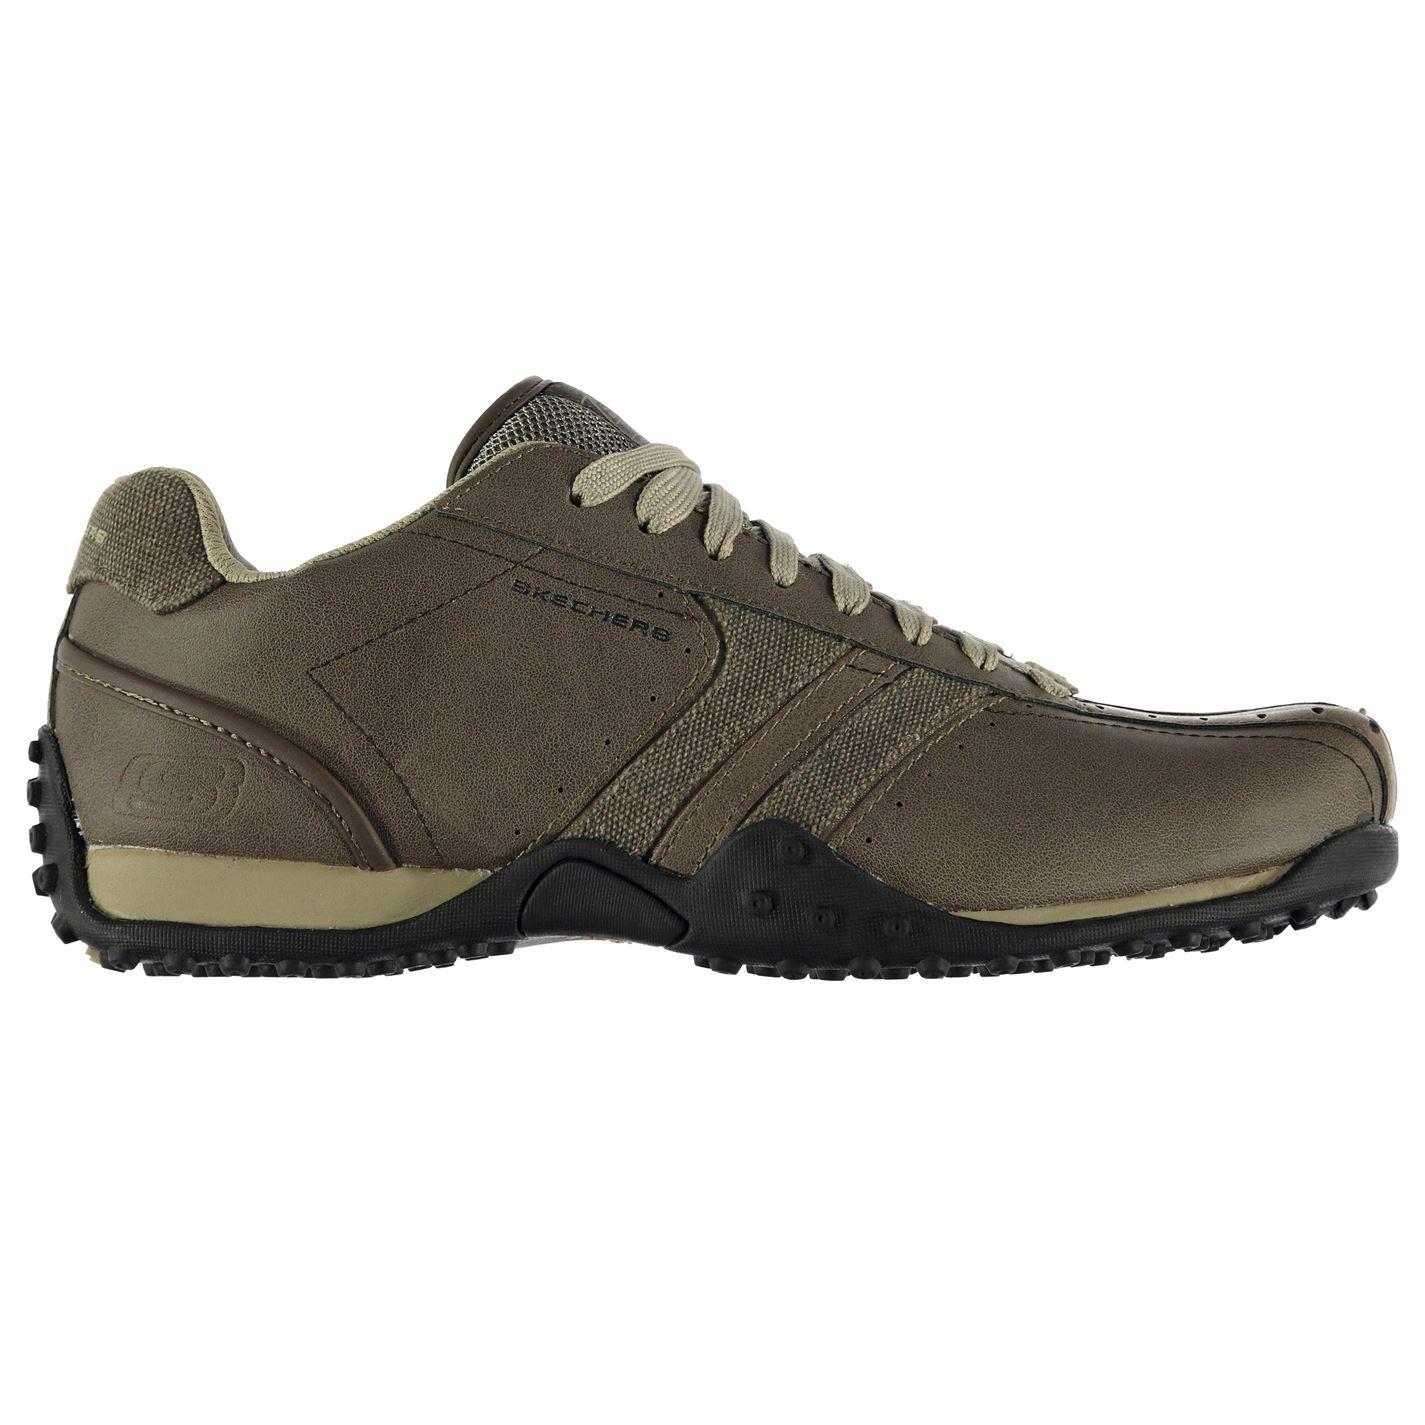 Skechers-Urban-Track-Forward-Trainers-Mens-Athleisure-Footwear-Shoes-Sneakers thumbnail 21